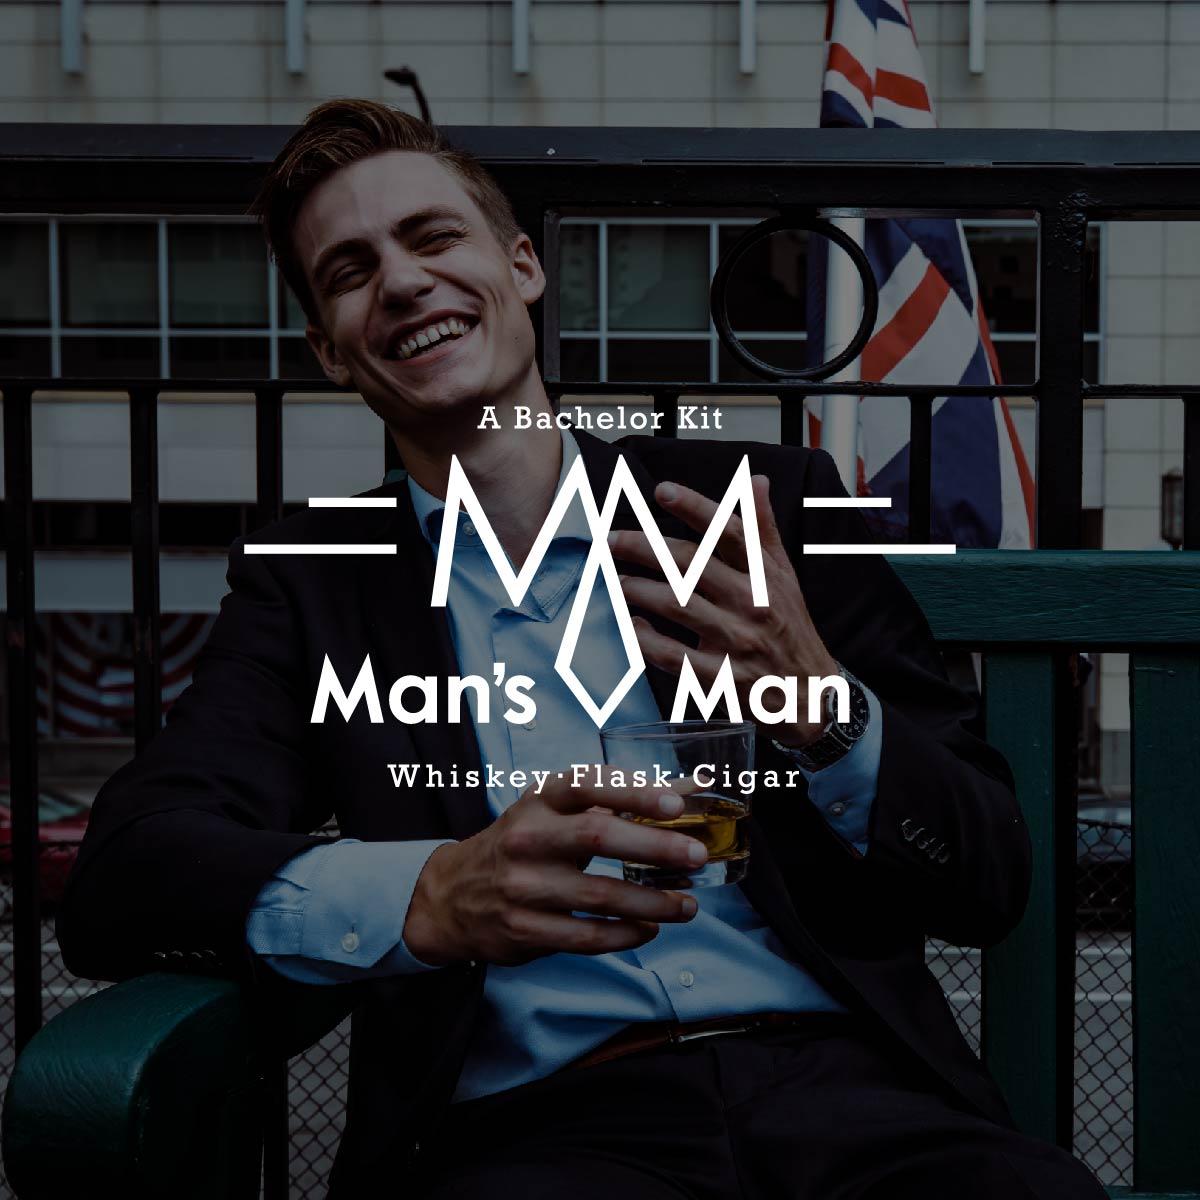 mans man-01.jpg